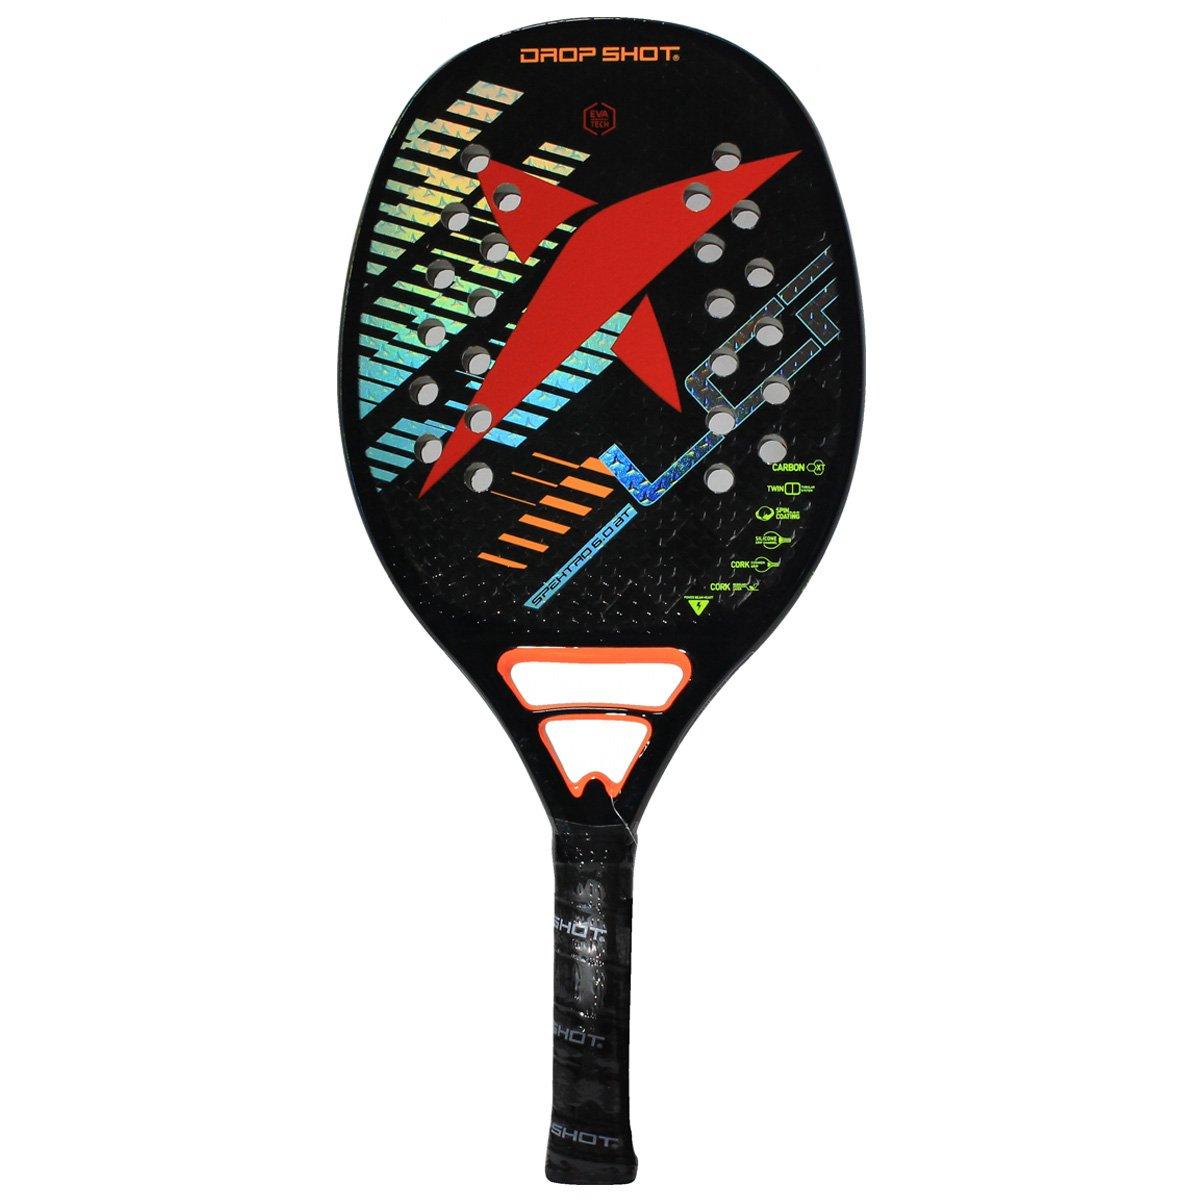 Raquete de beach tennis Drop Shot Spektro 6.0